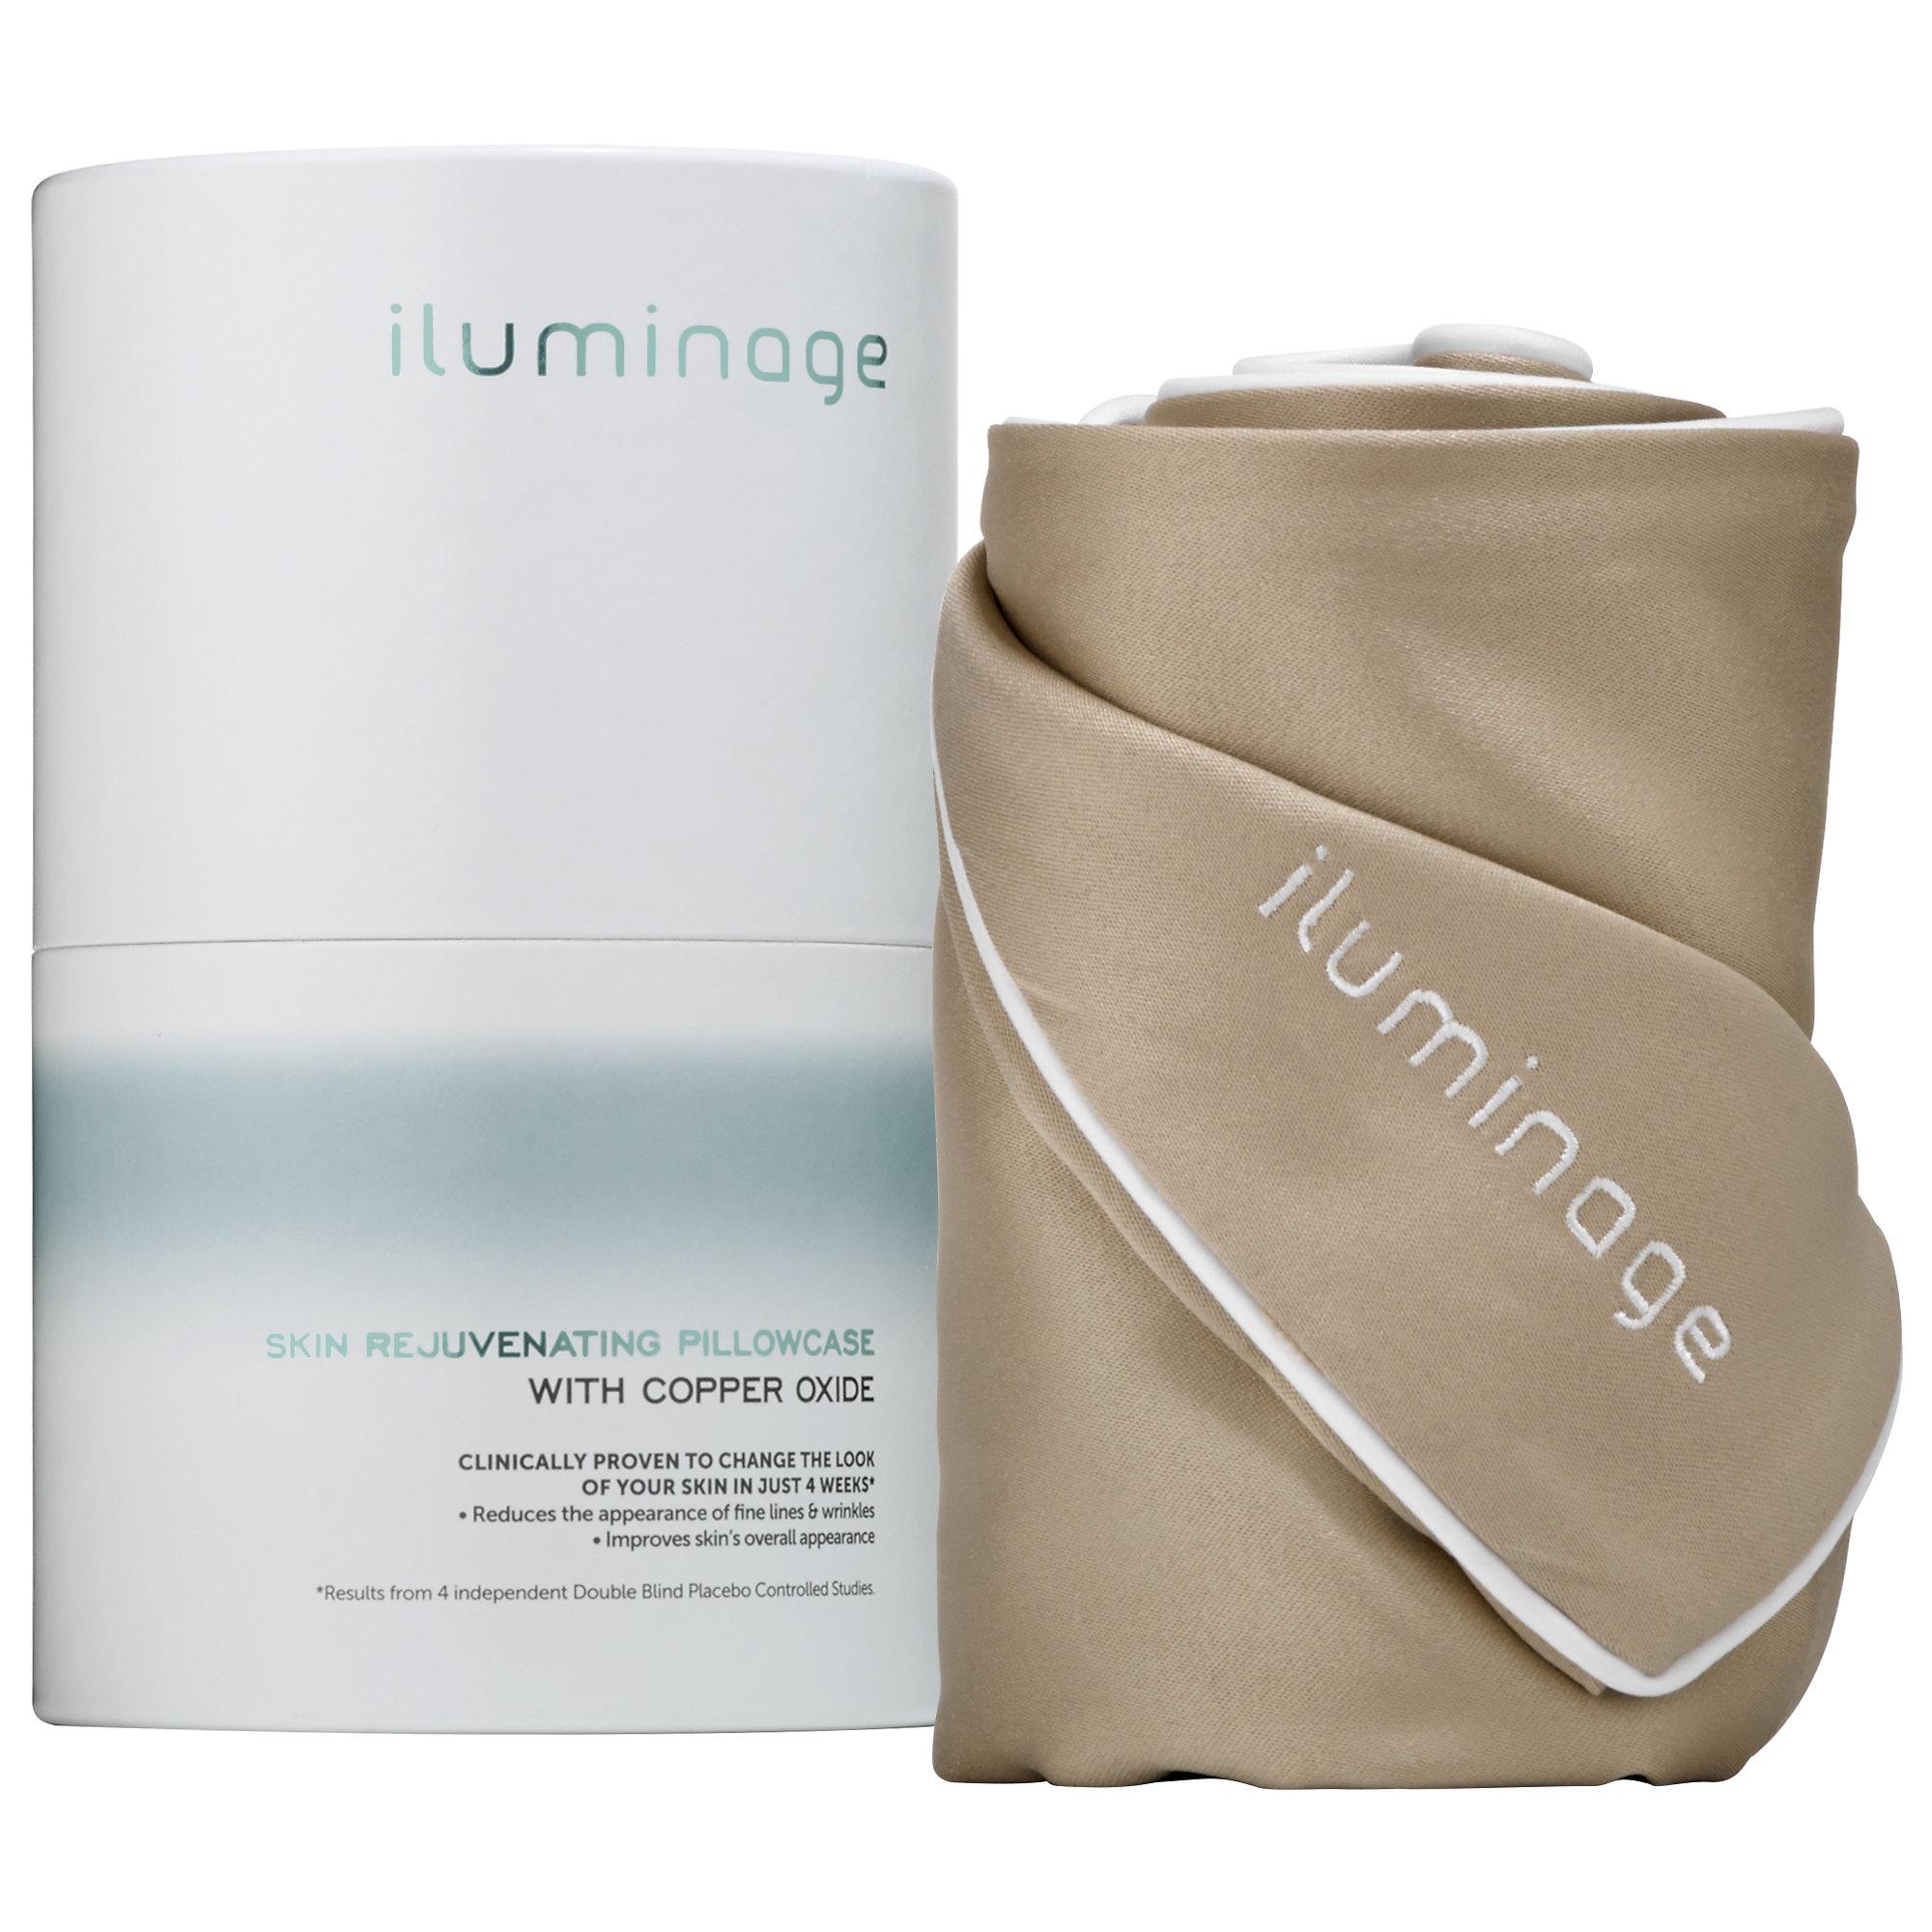 iluminage Skin Rejuvenating Pillowcase With Copper Oxide, $60 at Sephora